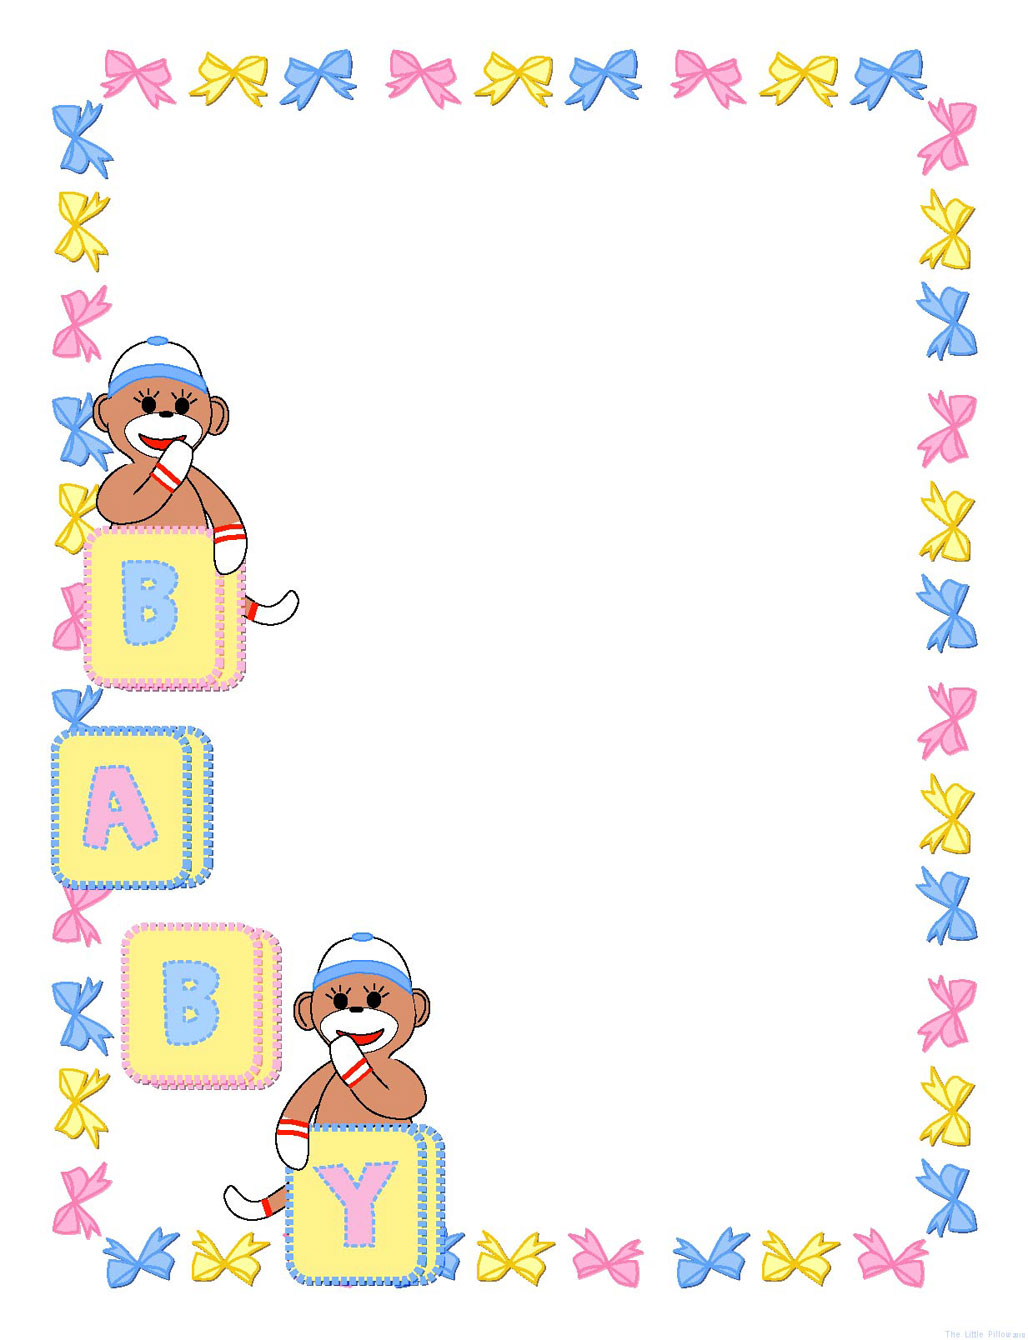 free baby scrapbook clipart - photo #48